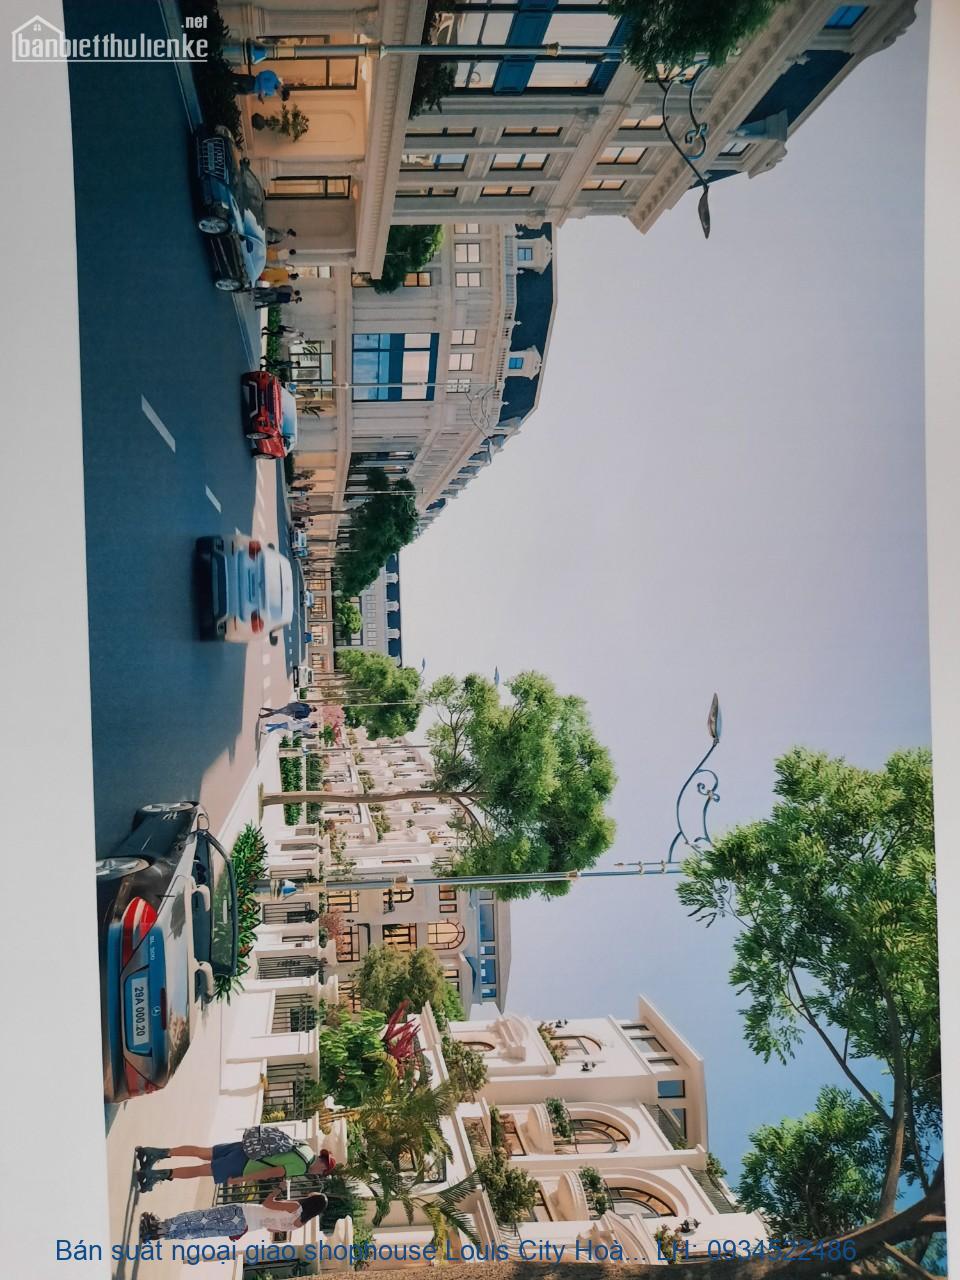 Bán suất ngoại giao shophouse Louis City Hoàng Mai vị trí đẹp giá rẻ